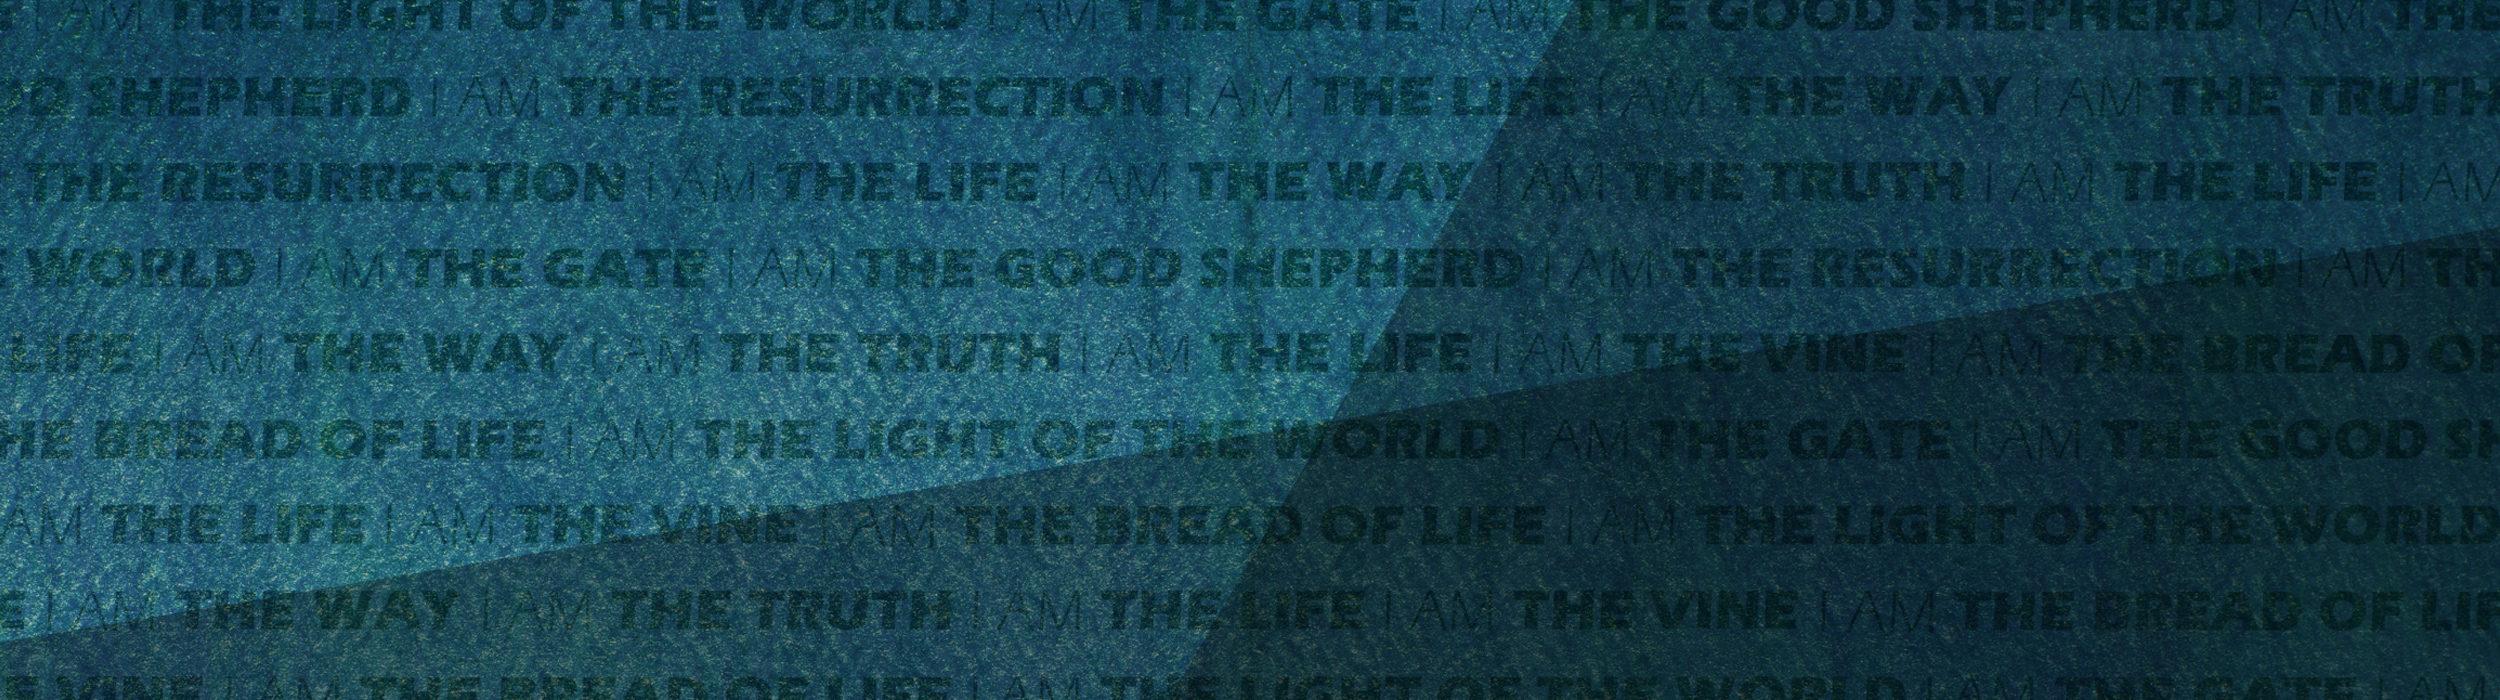 Sermon Series: the Book of John